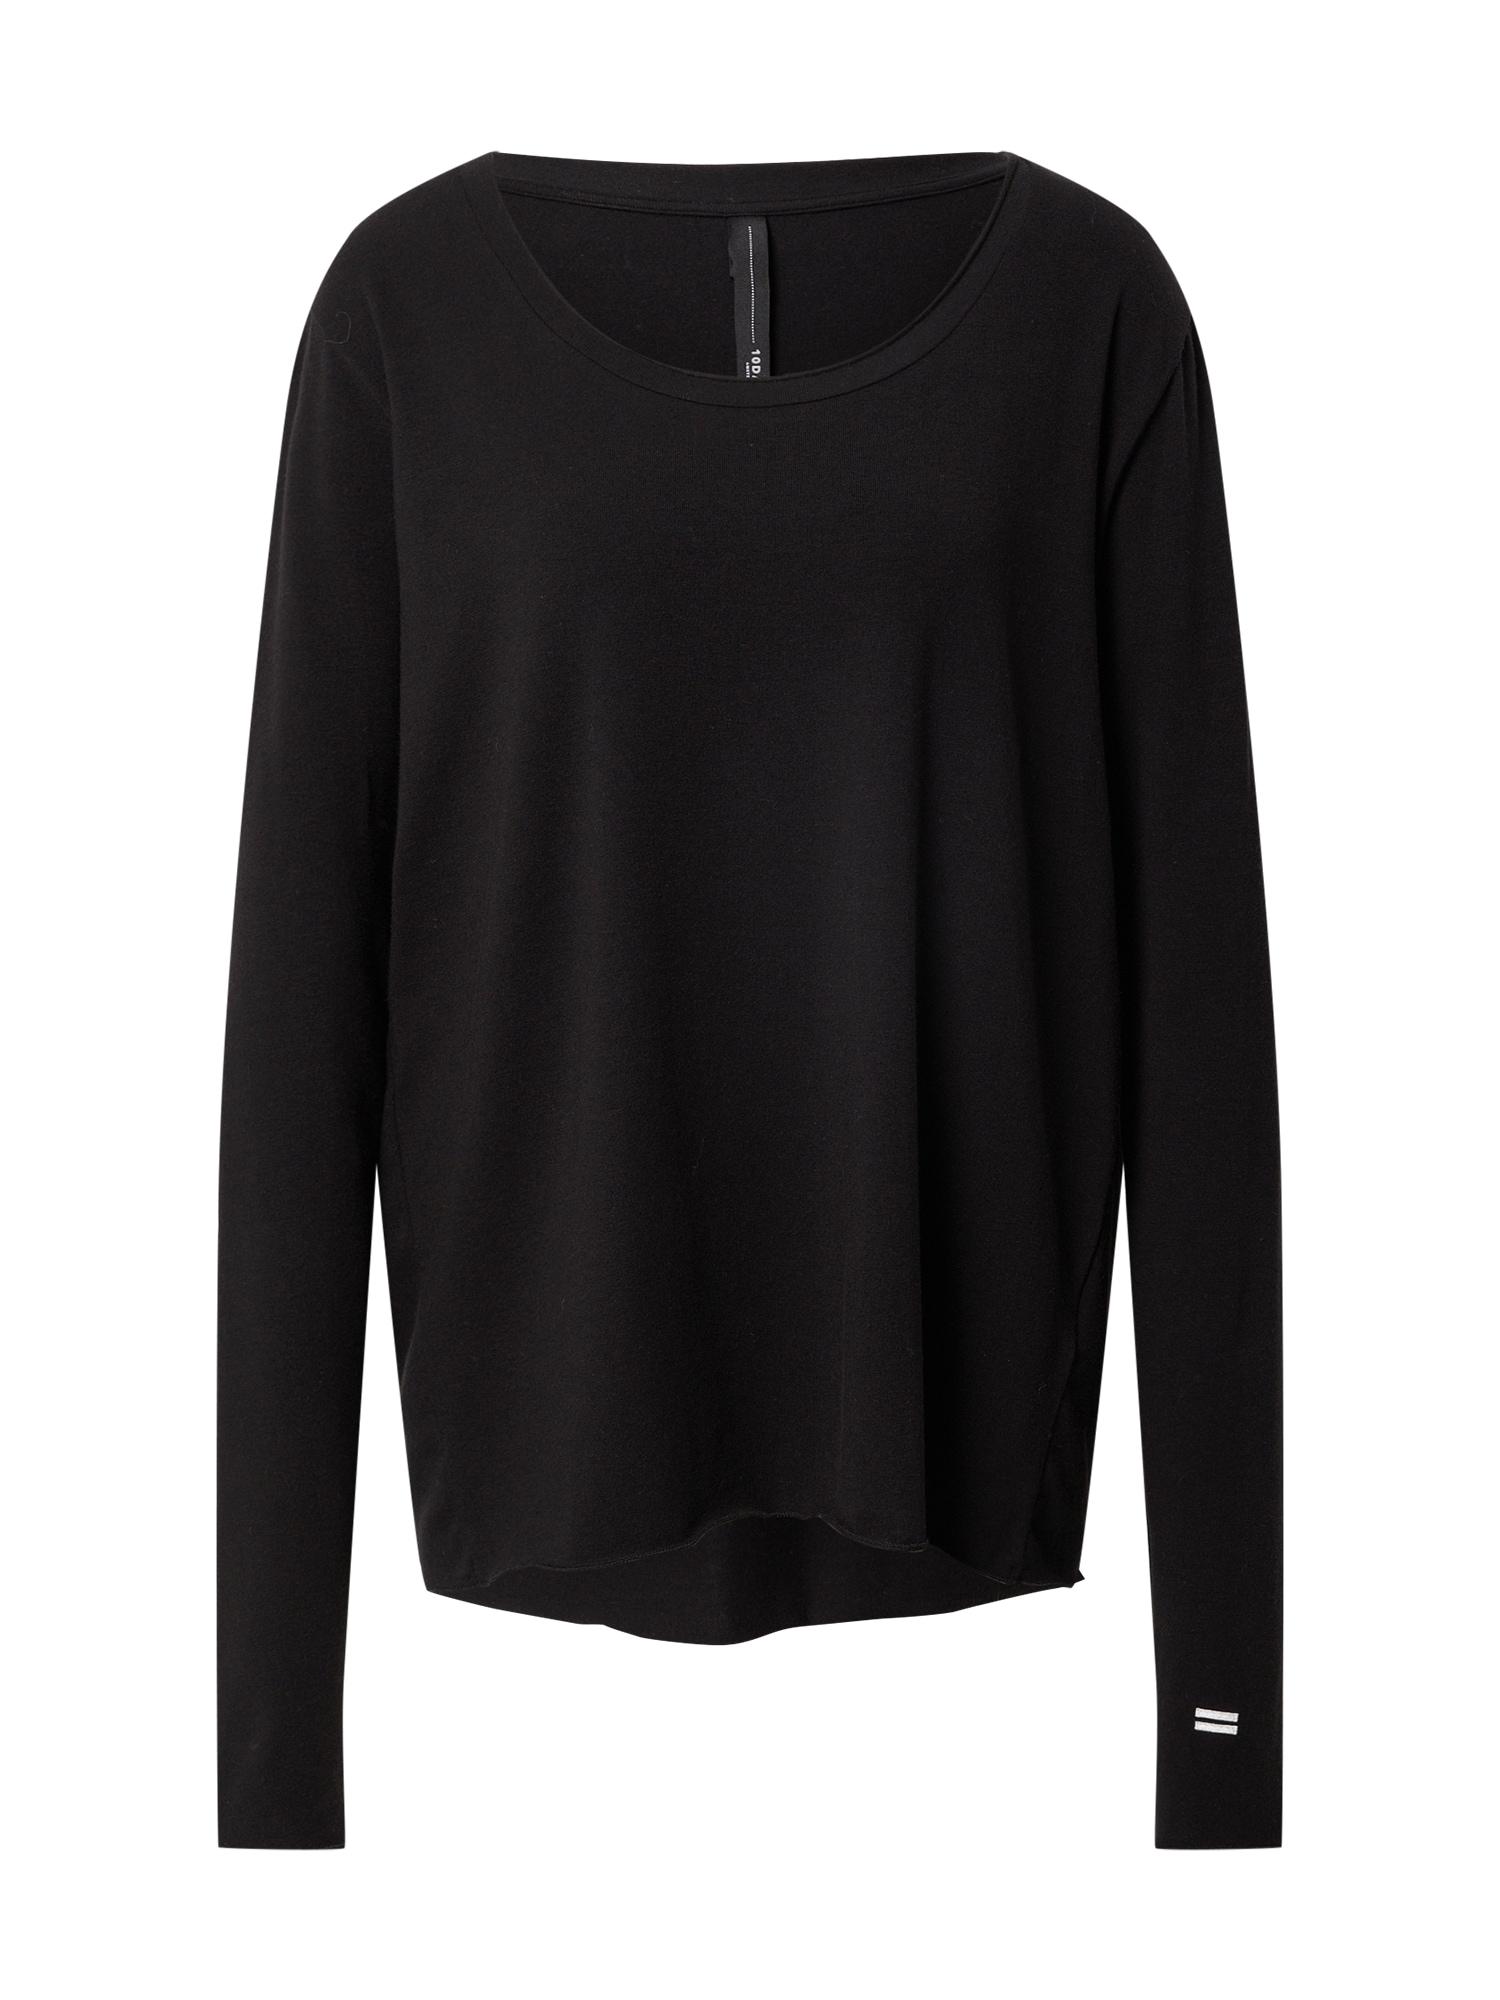 10Days Megztinis juoda / balta